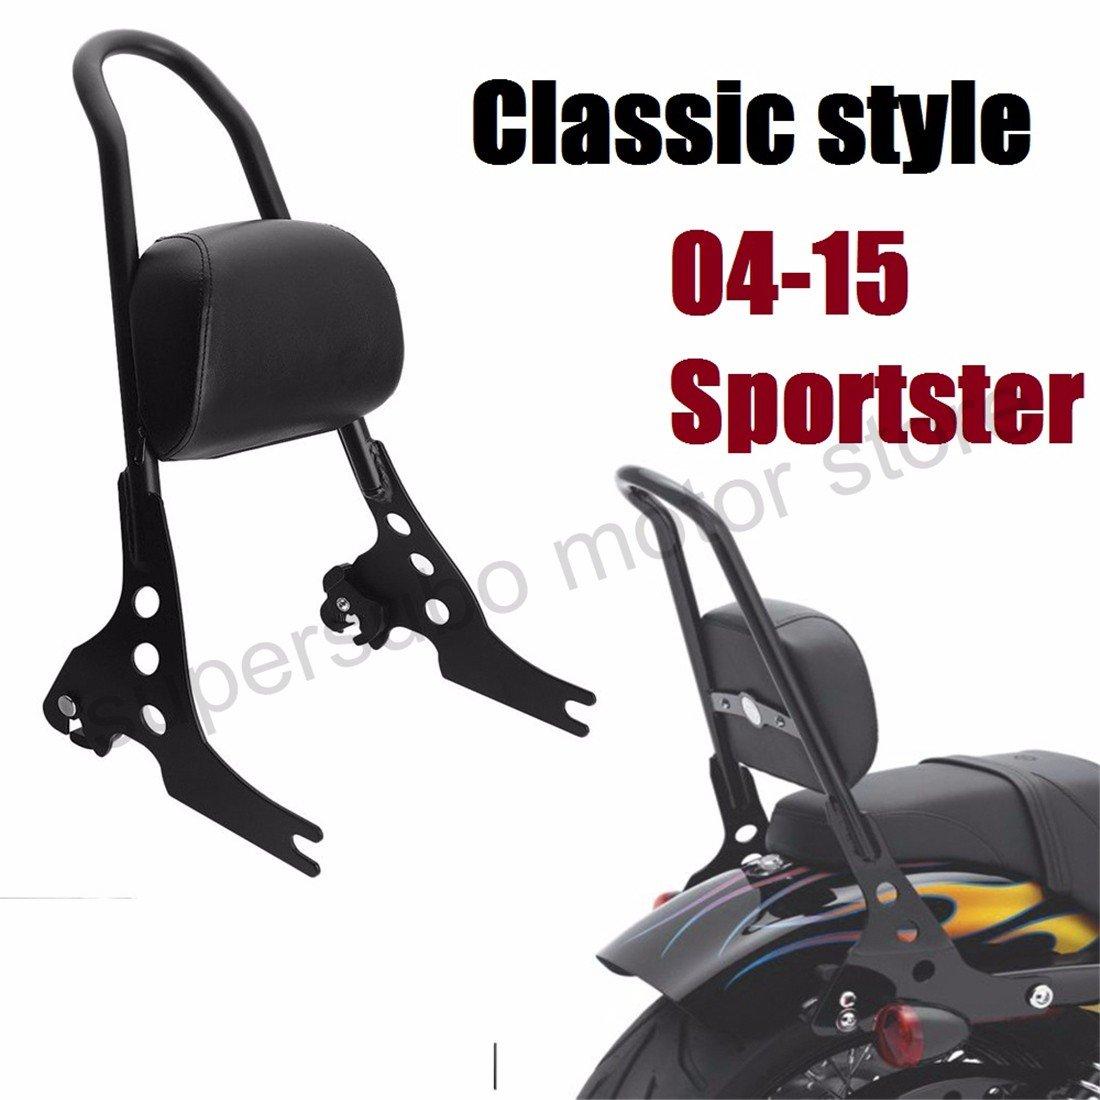 Moto Passeggero harley Schienale sportivo harley sissy bar Cuscino ammortizzatore per Harley Sportster XL883 1200 48 04-15 nero